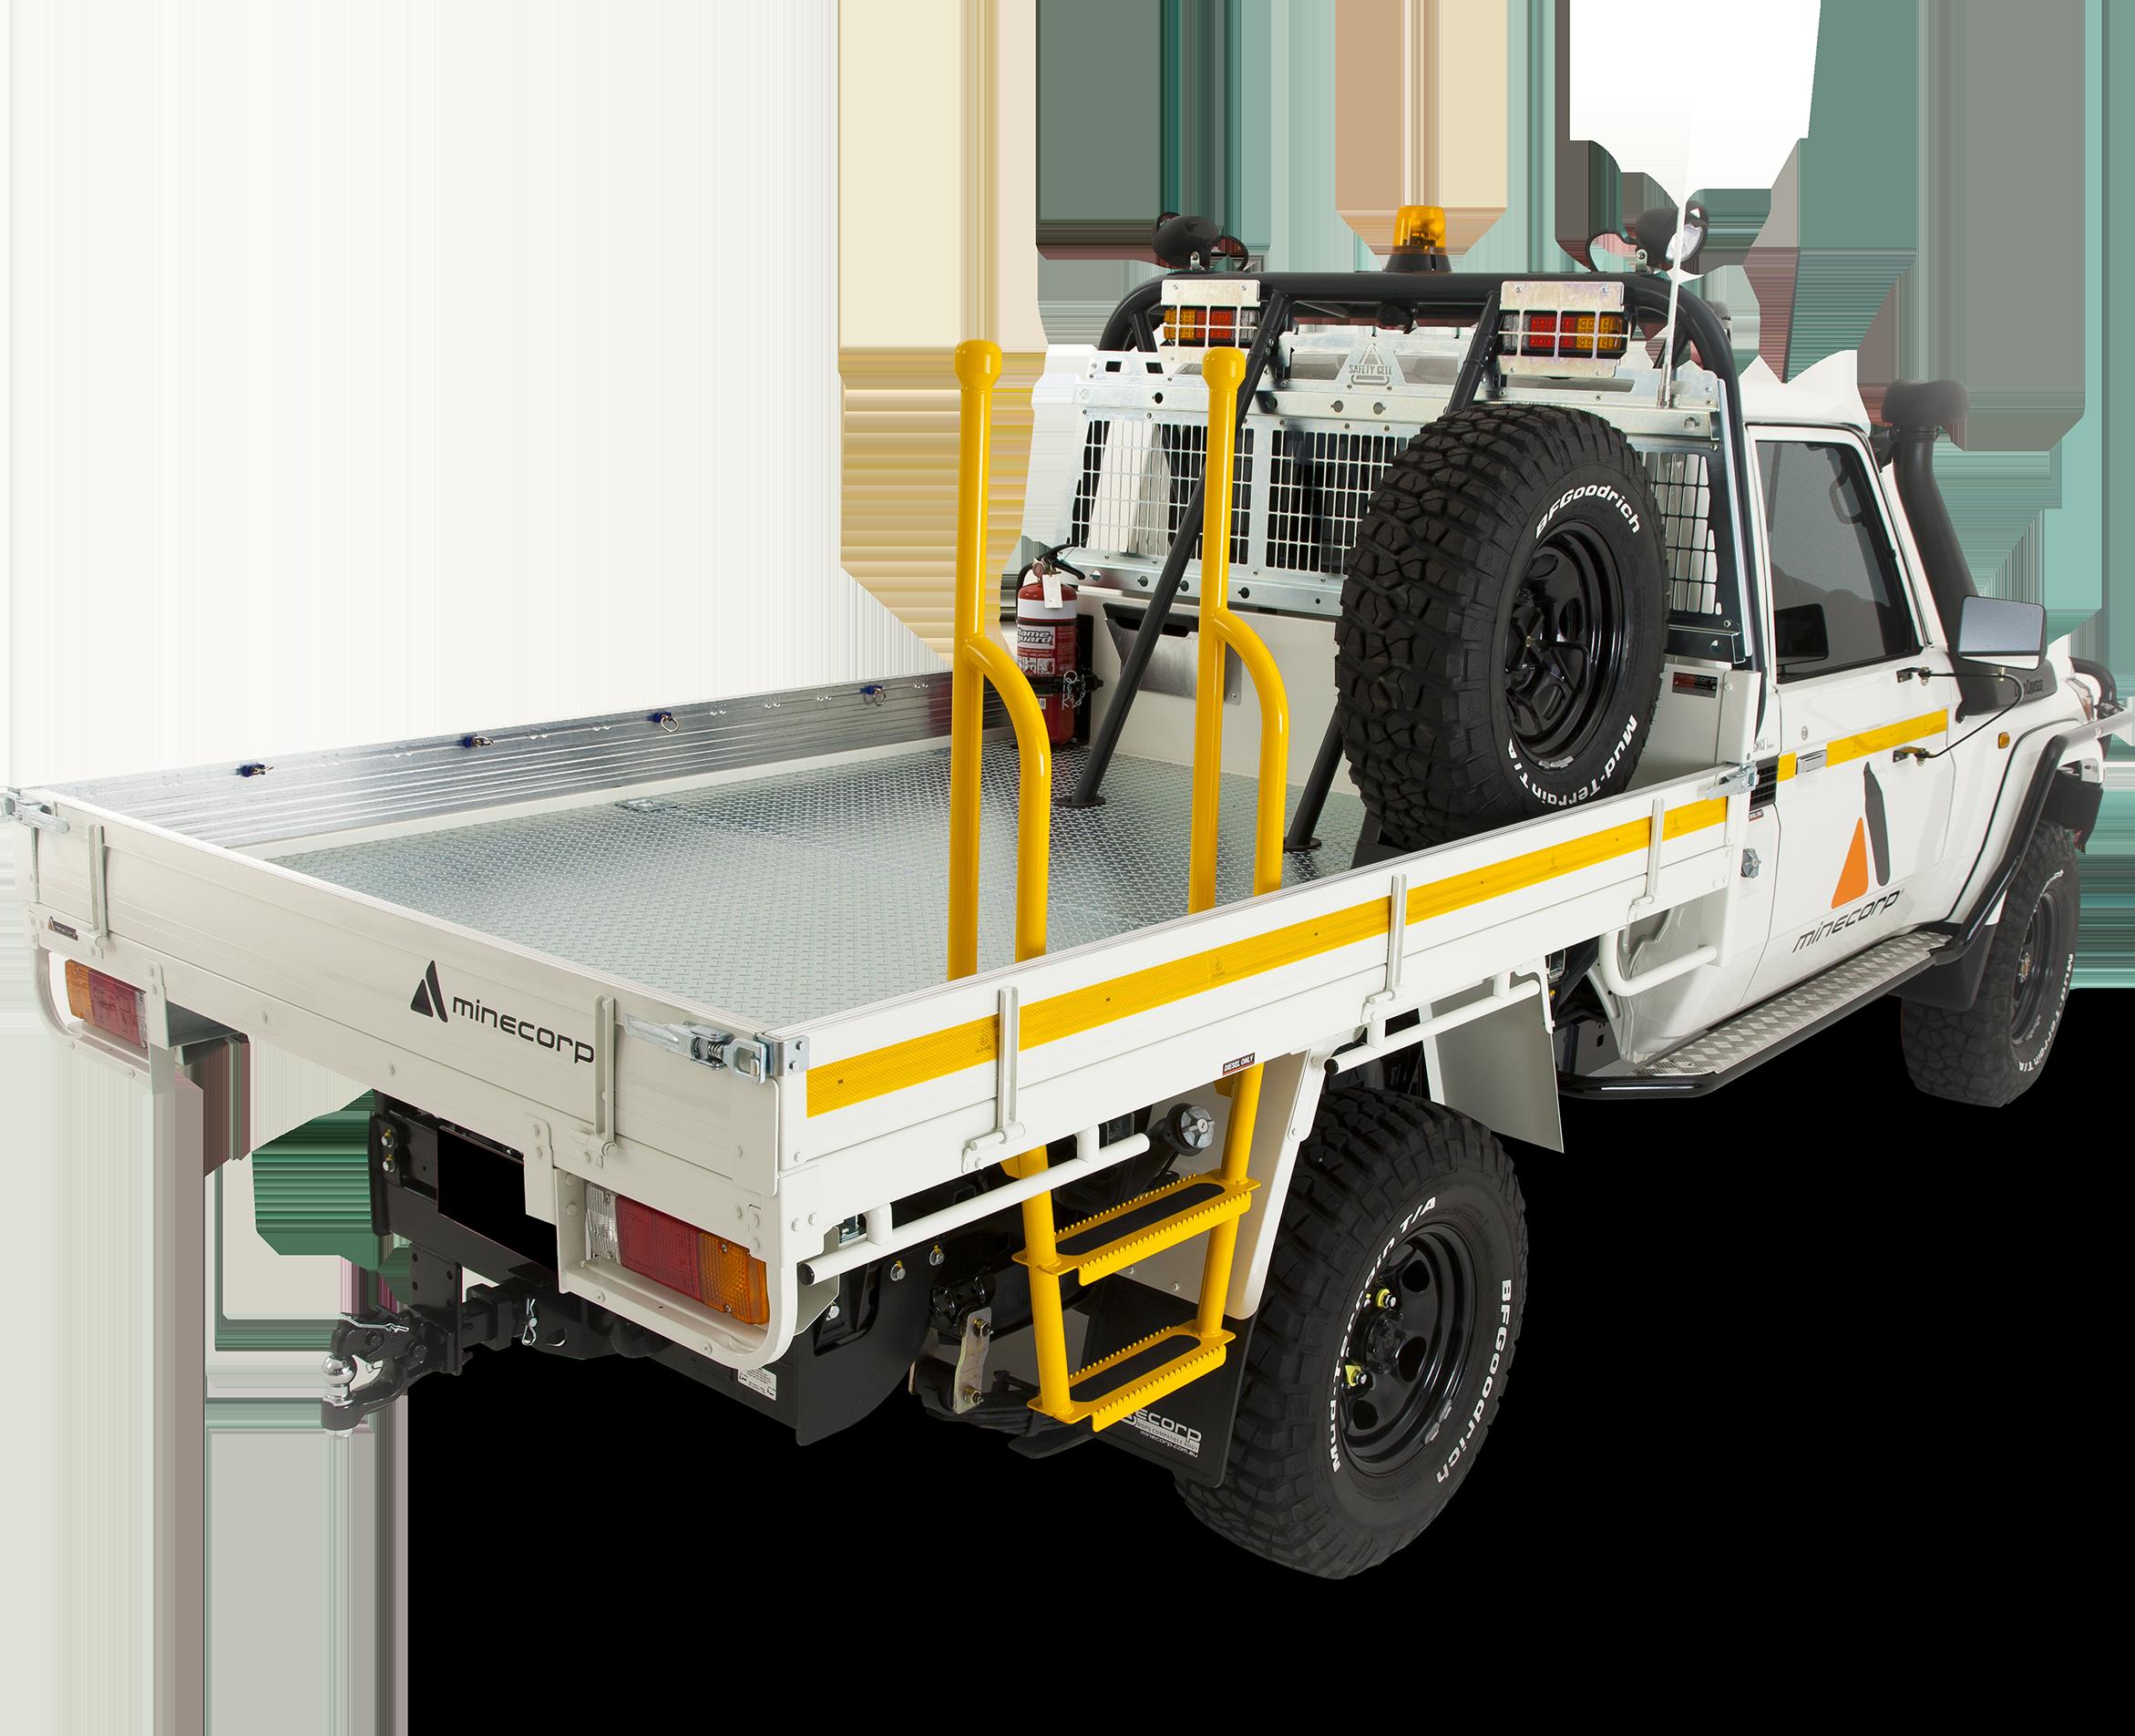 Studio - Toyota Landcruiser 79 Single Cab - Ladder Tray Reflective Tape (2)